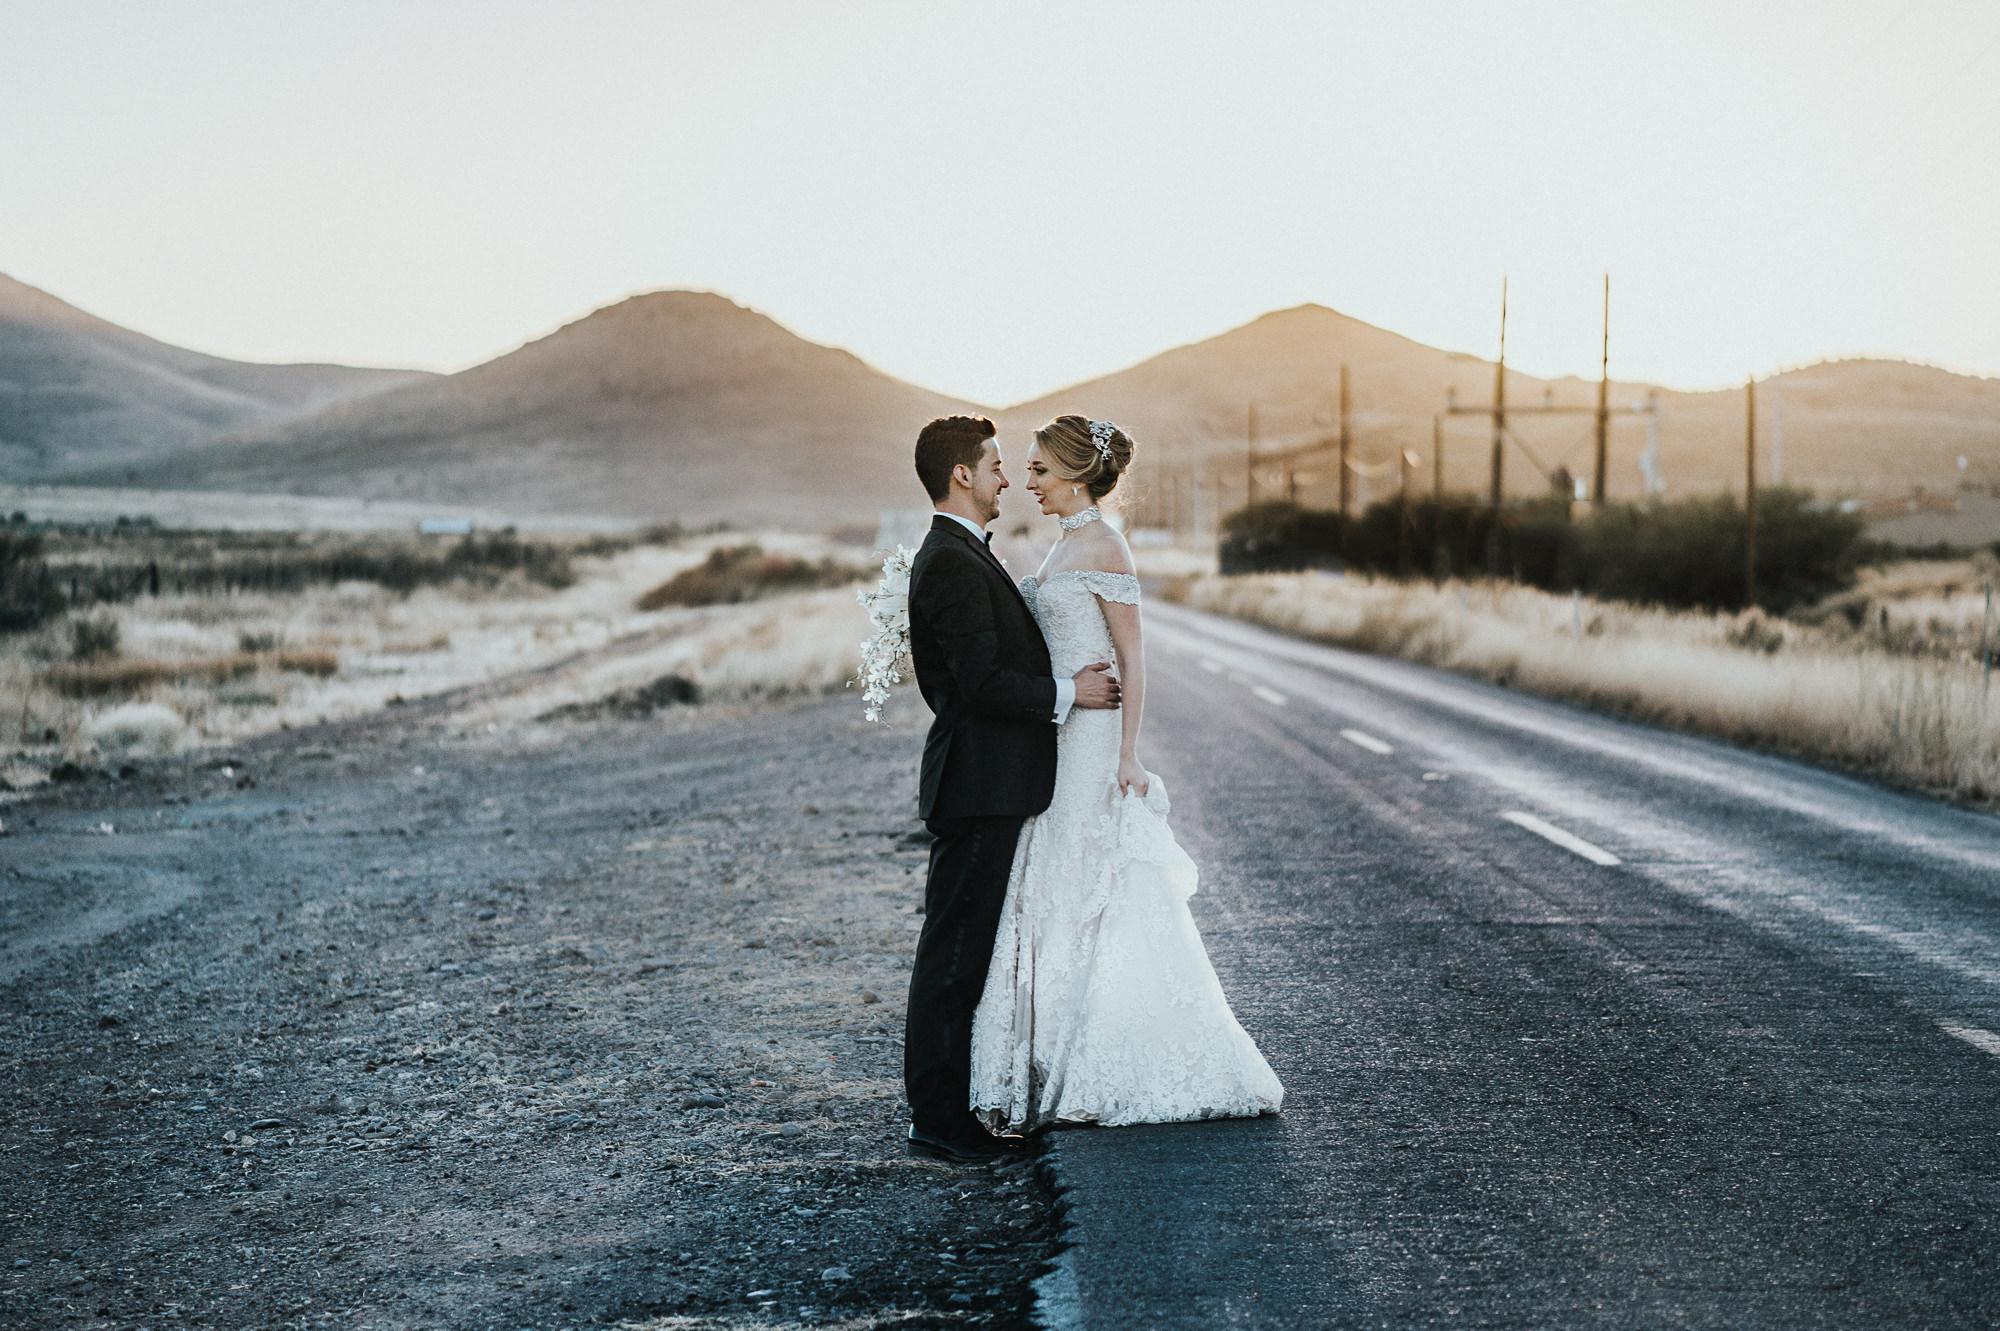 Mario-Karla-Wedding-134